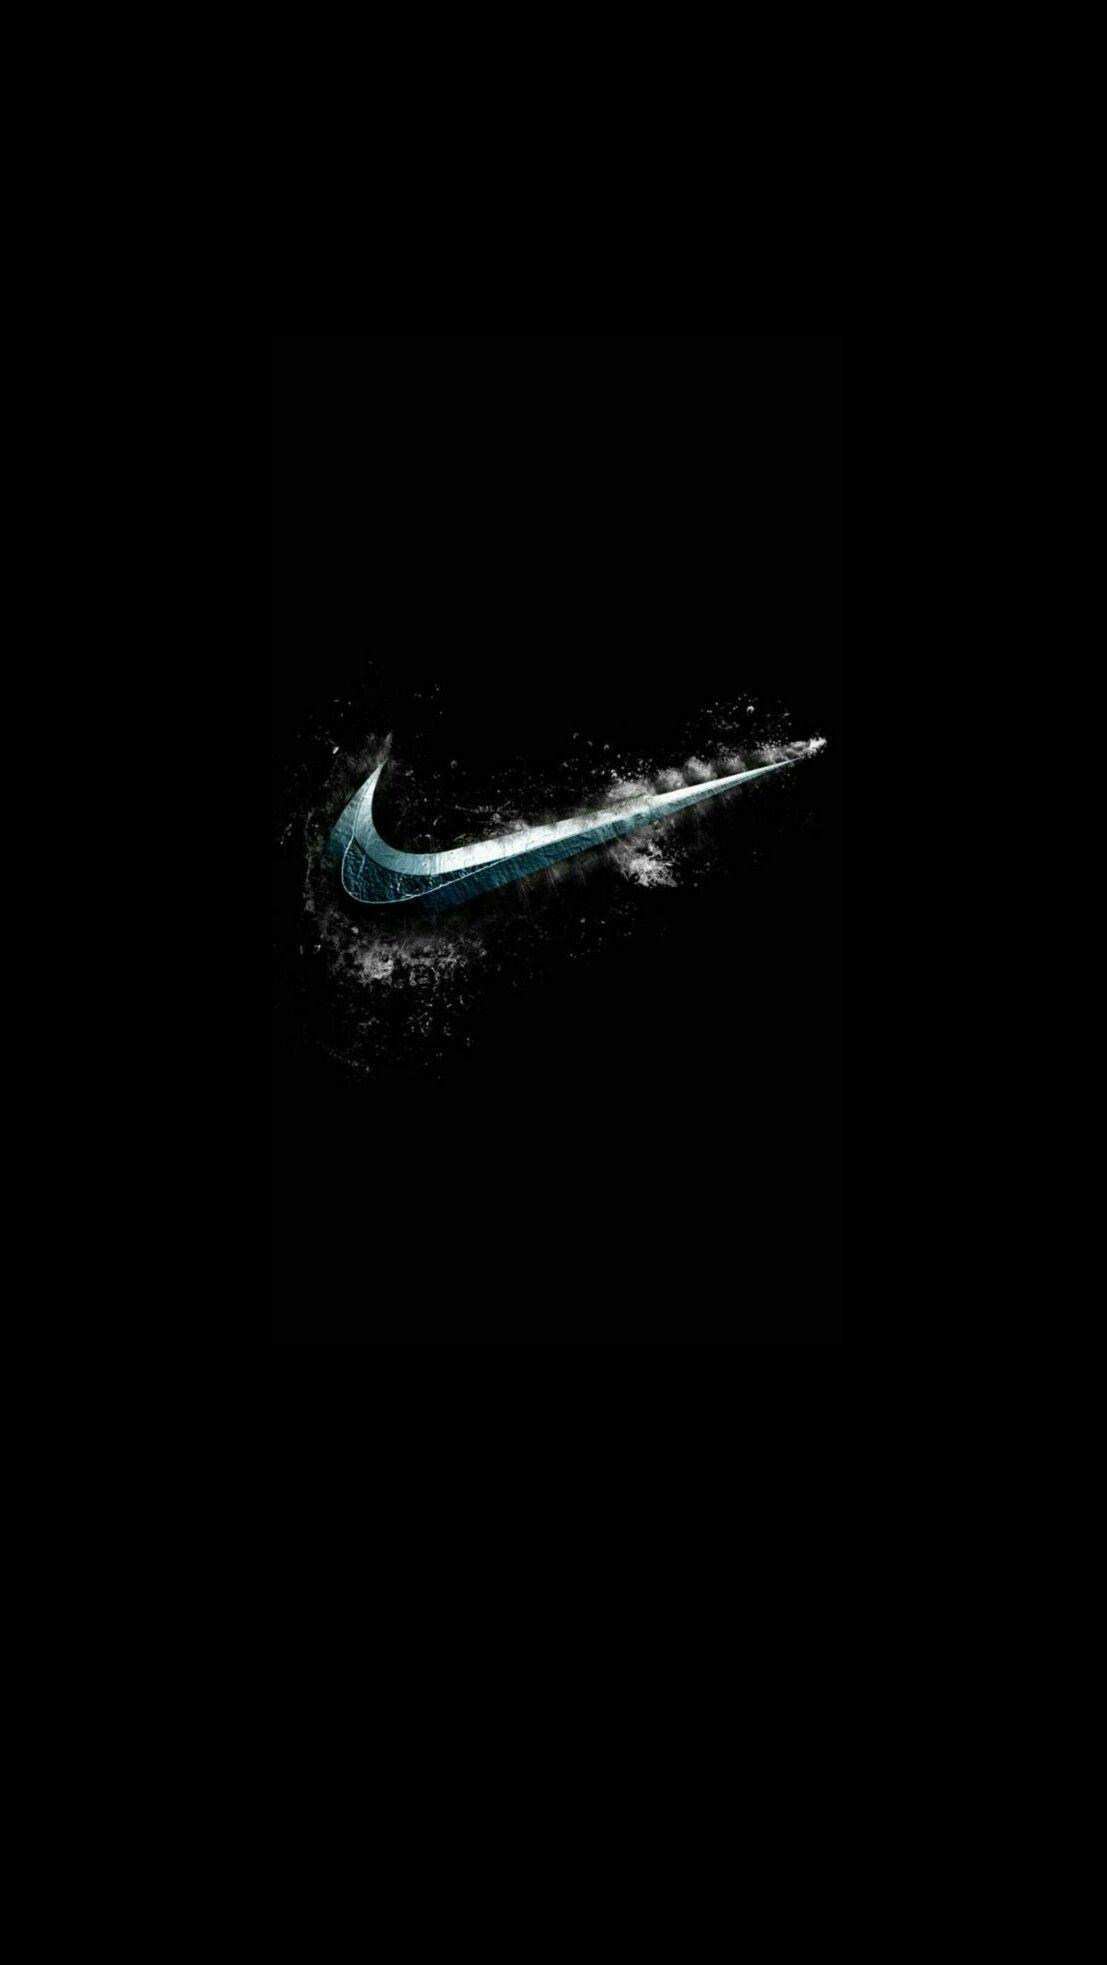 Nike Black Wallpaper Iphone Android Fondos Cosas